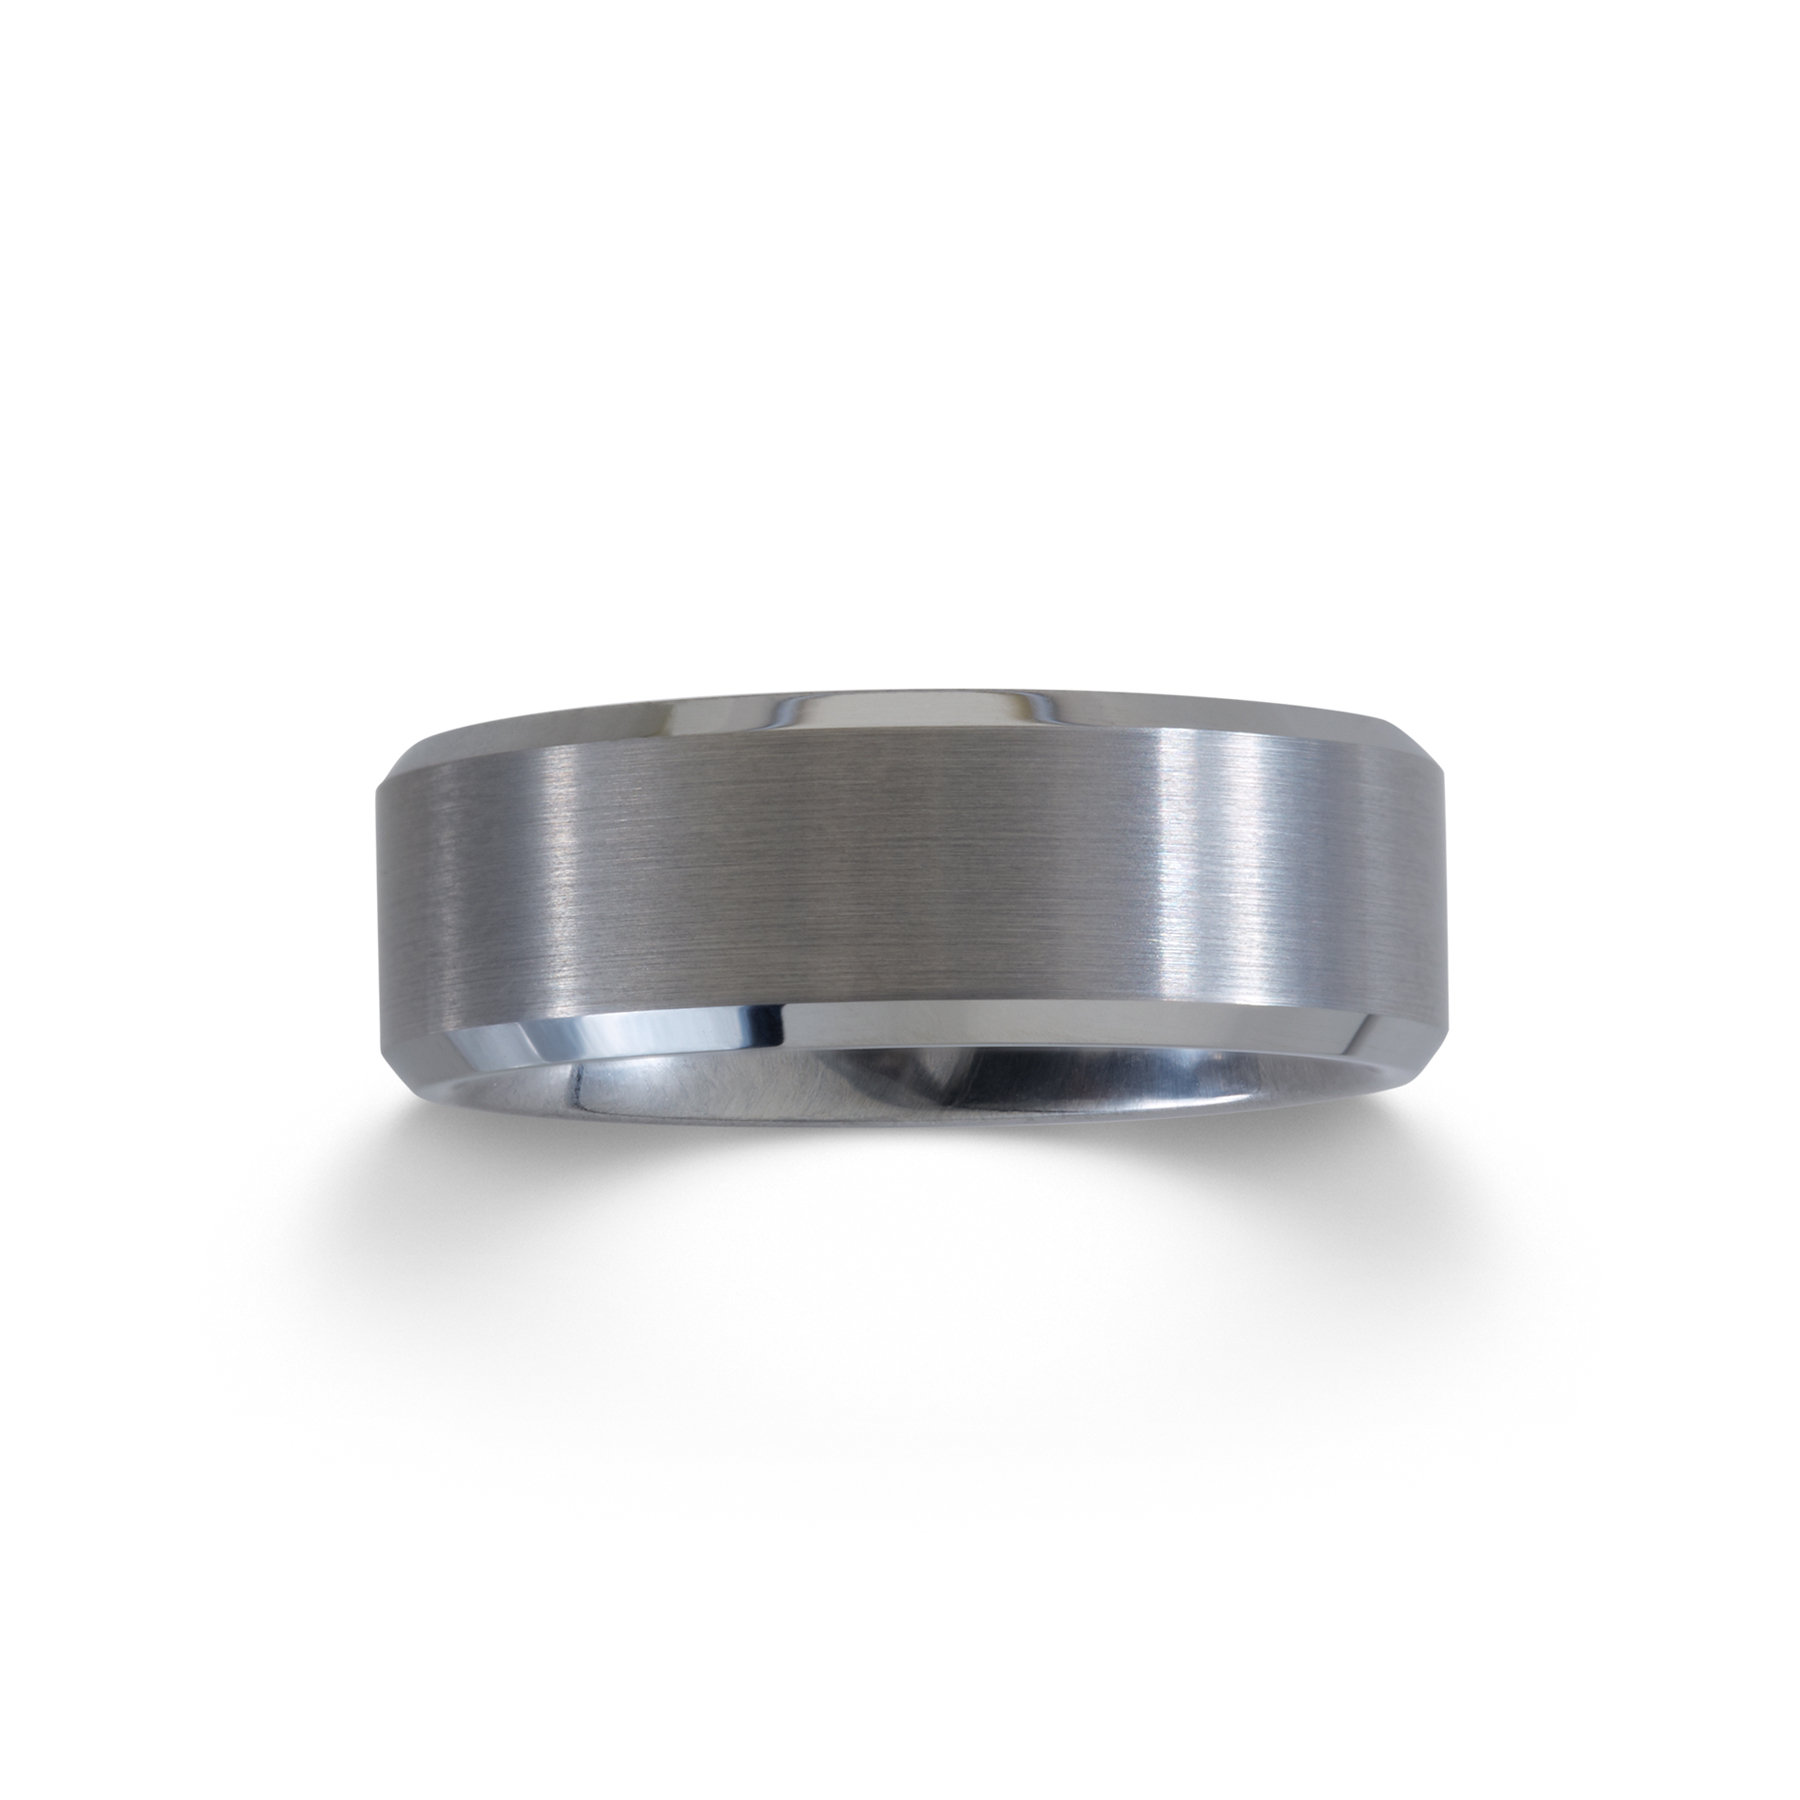 b sears wedding rings Men s